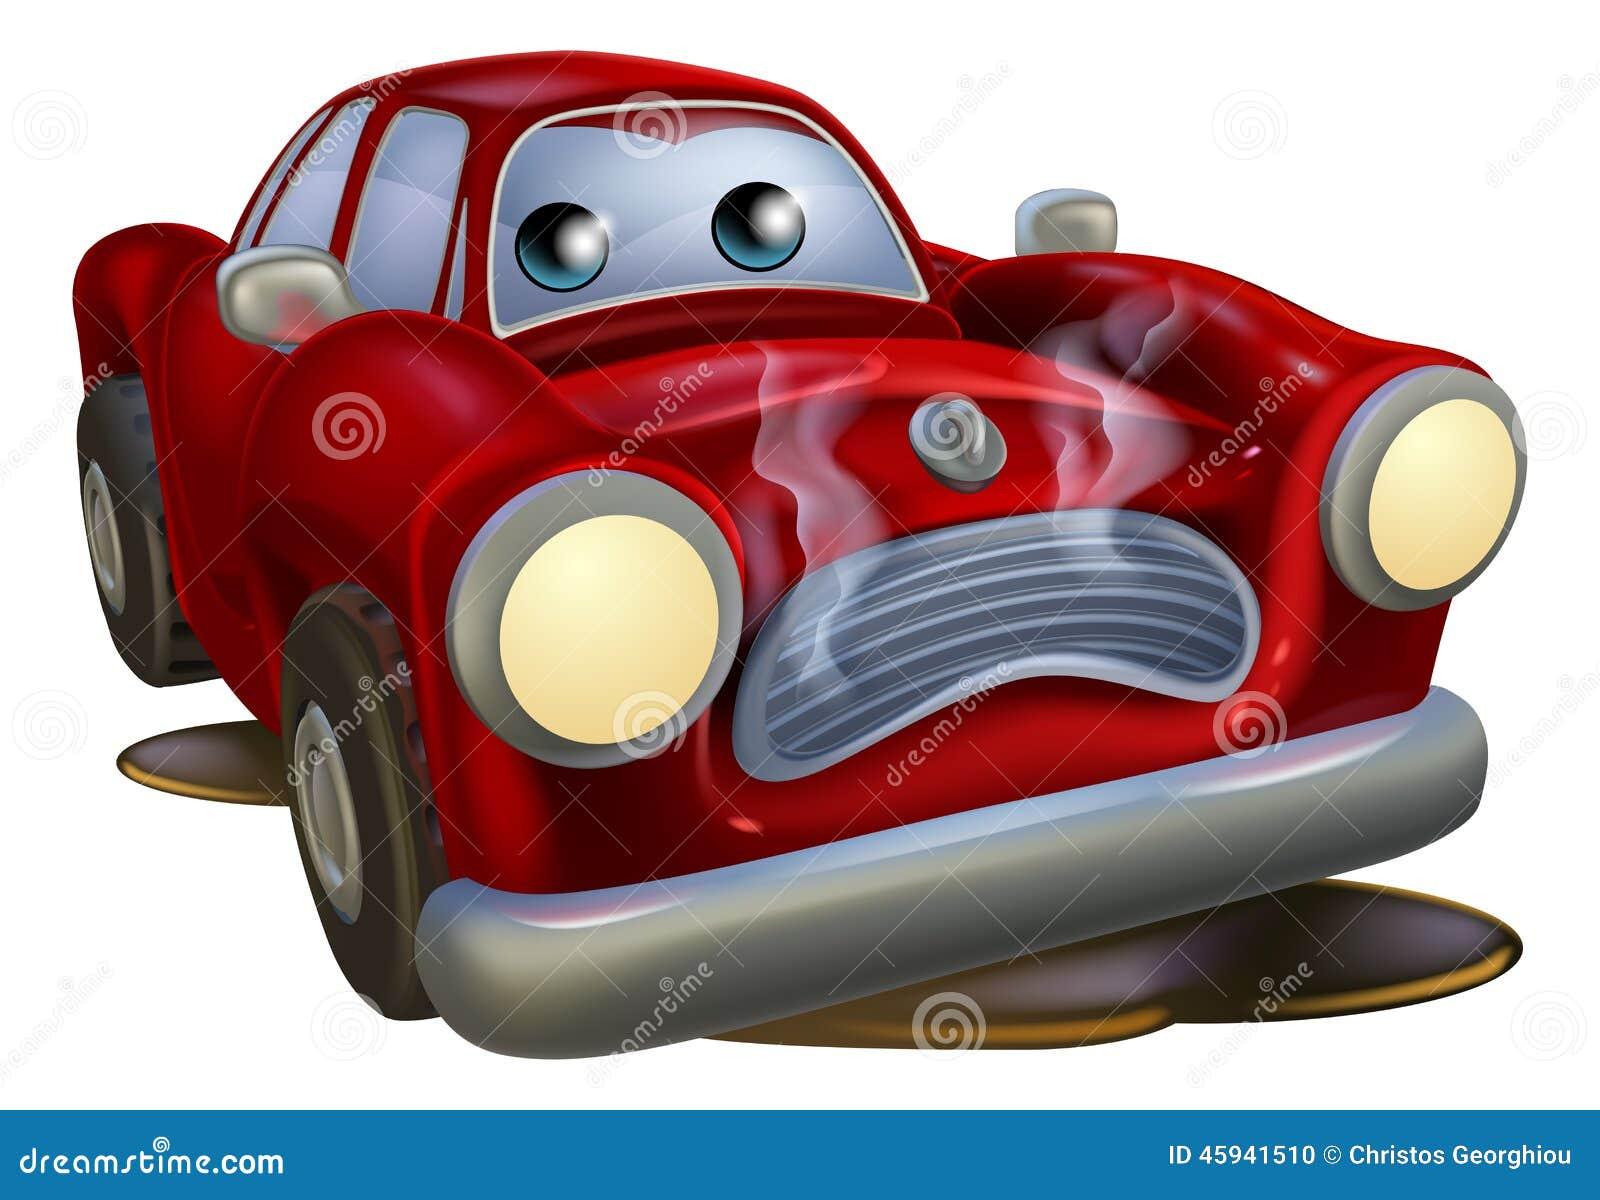 Majestic Car Wash >> Sad Broken Down Cartoon Car Stock Vector - Image: 45941510